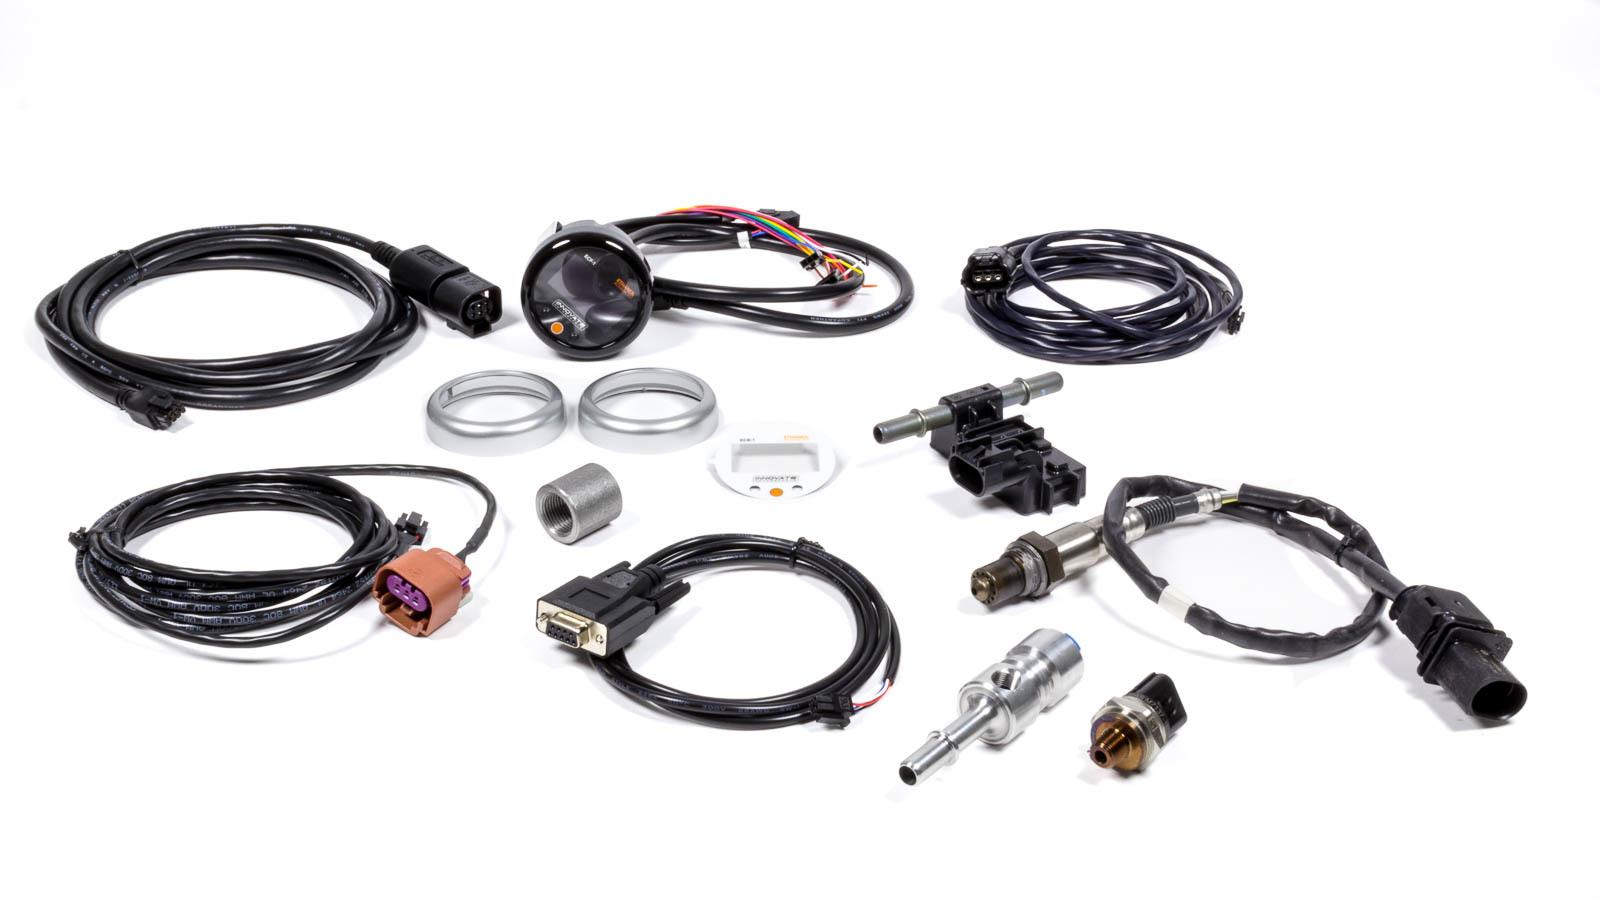 Innovate Motorsports 3903 Gauge Kit, Digital, ECF-1, Ethanol Content / Fuel Temperature / Fuel Pressure / Wideband O2, Multifunction, Ethanol Sensor Included, Kit